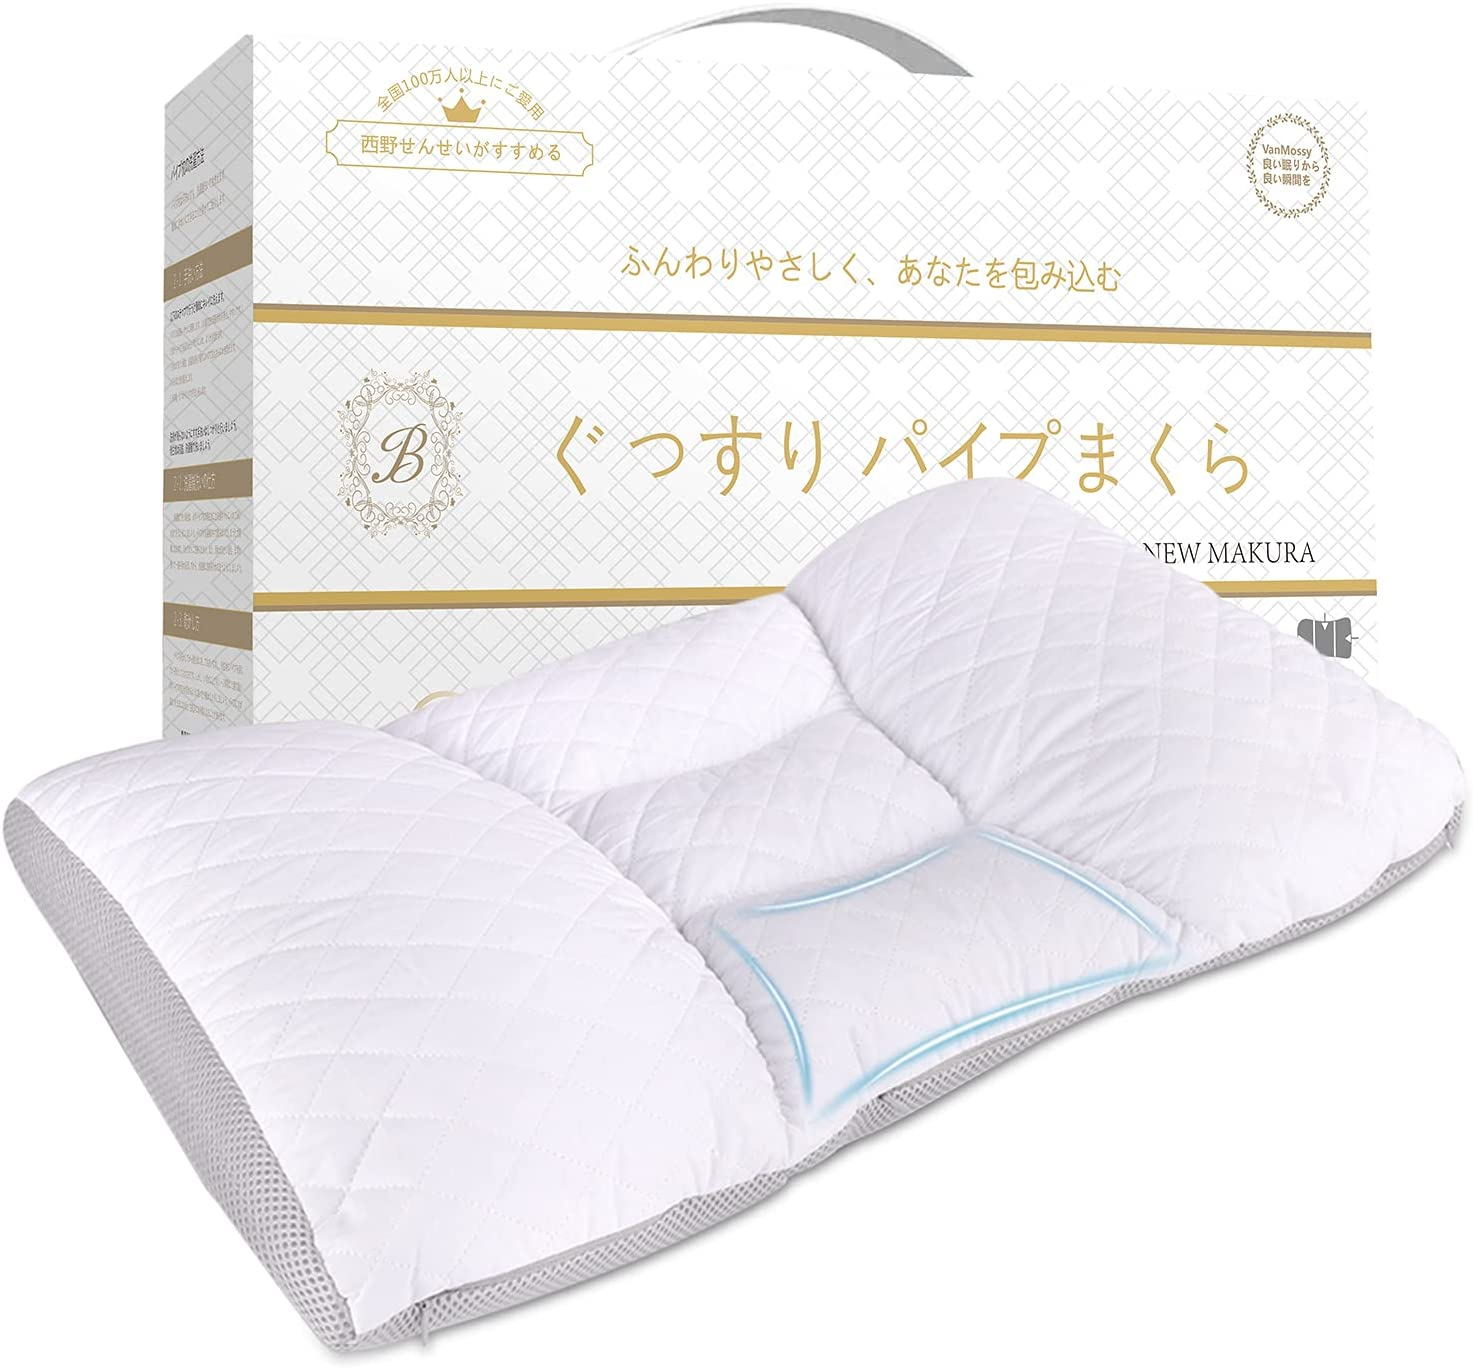 VanMossy ぐっすりパイプ枕